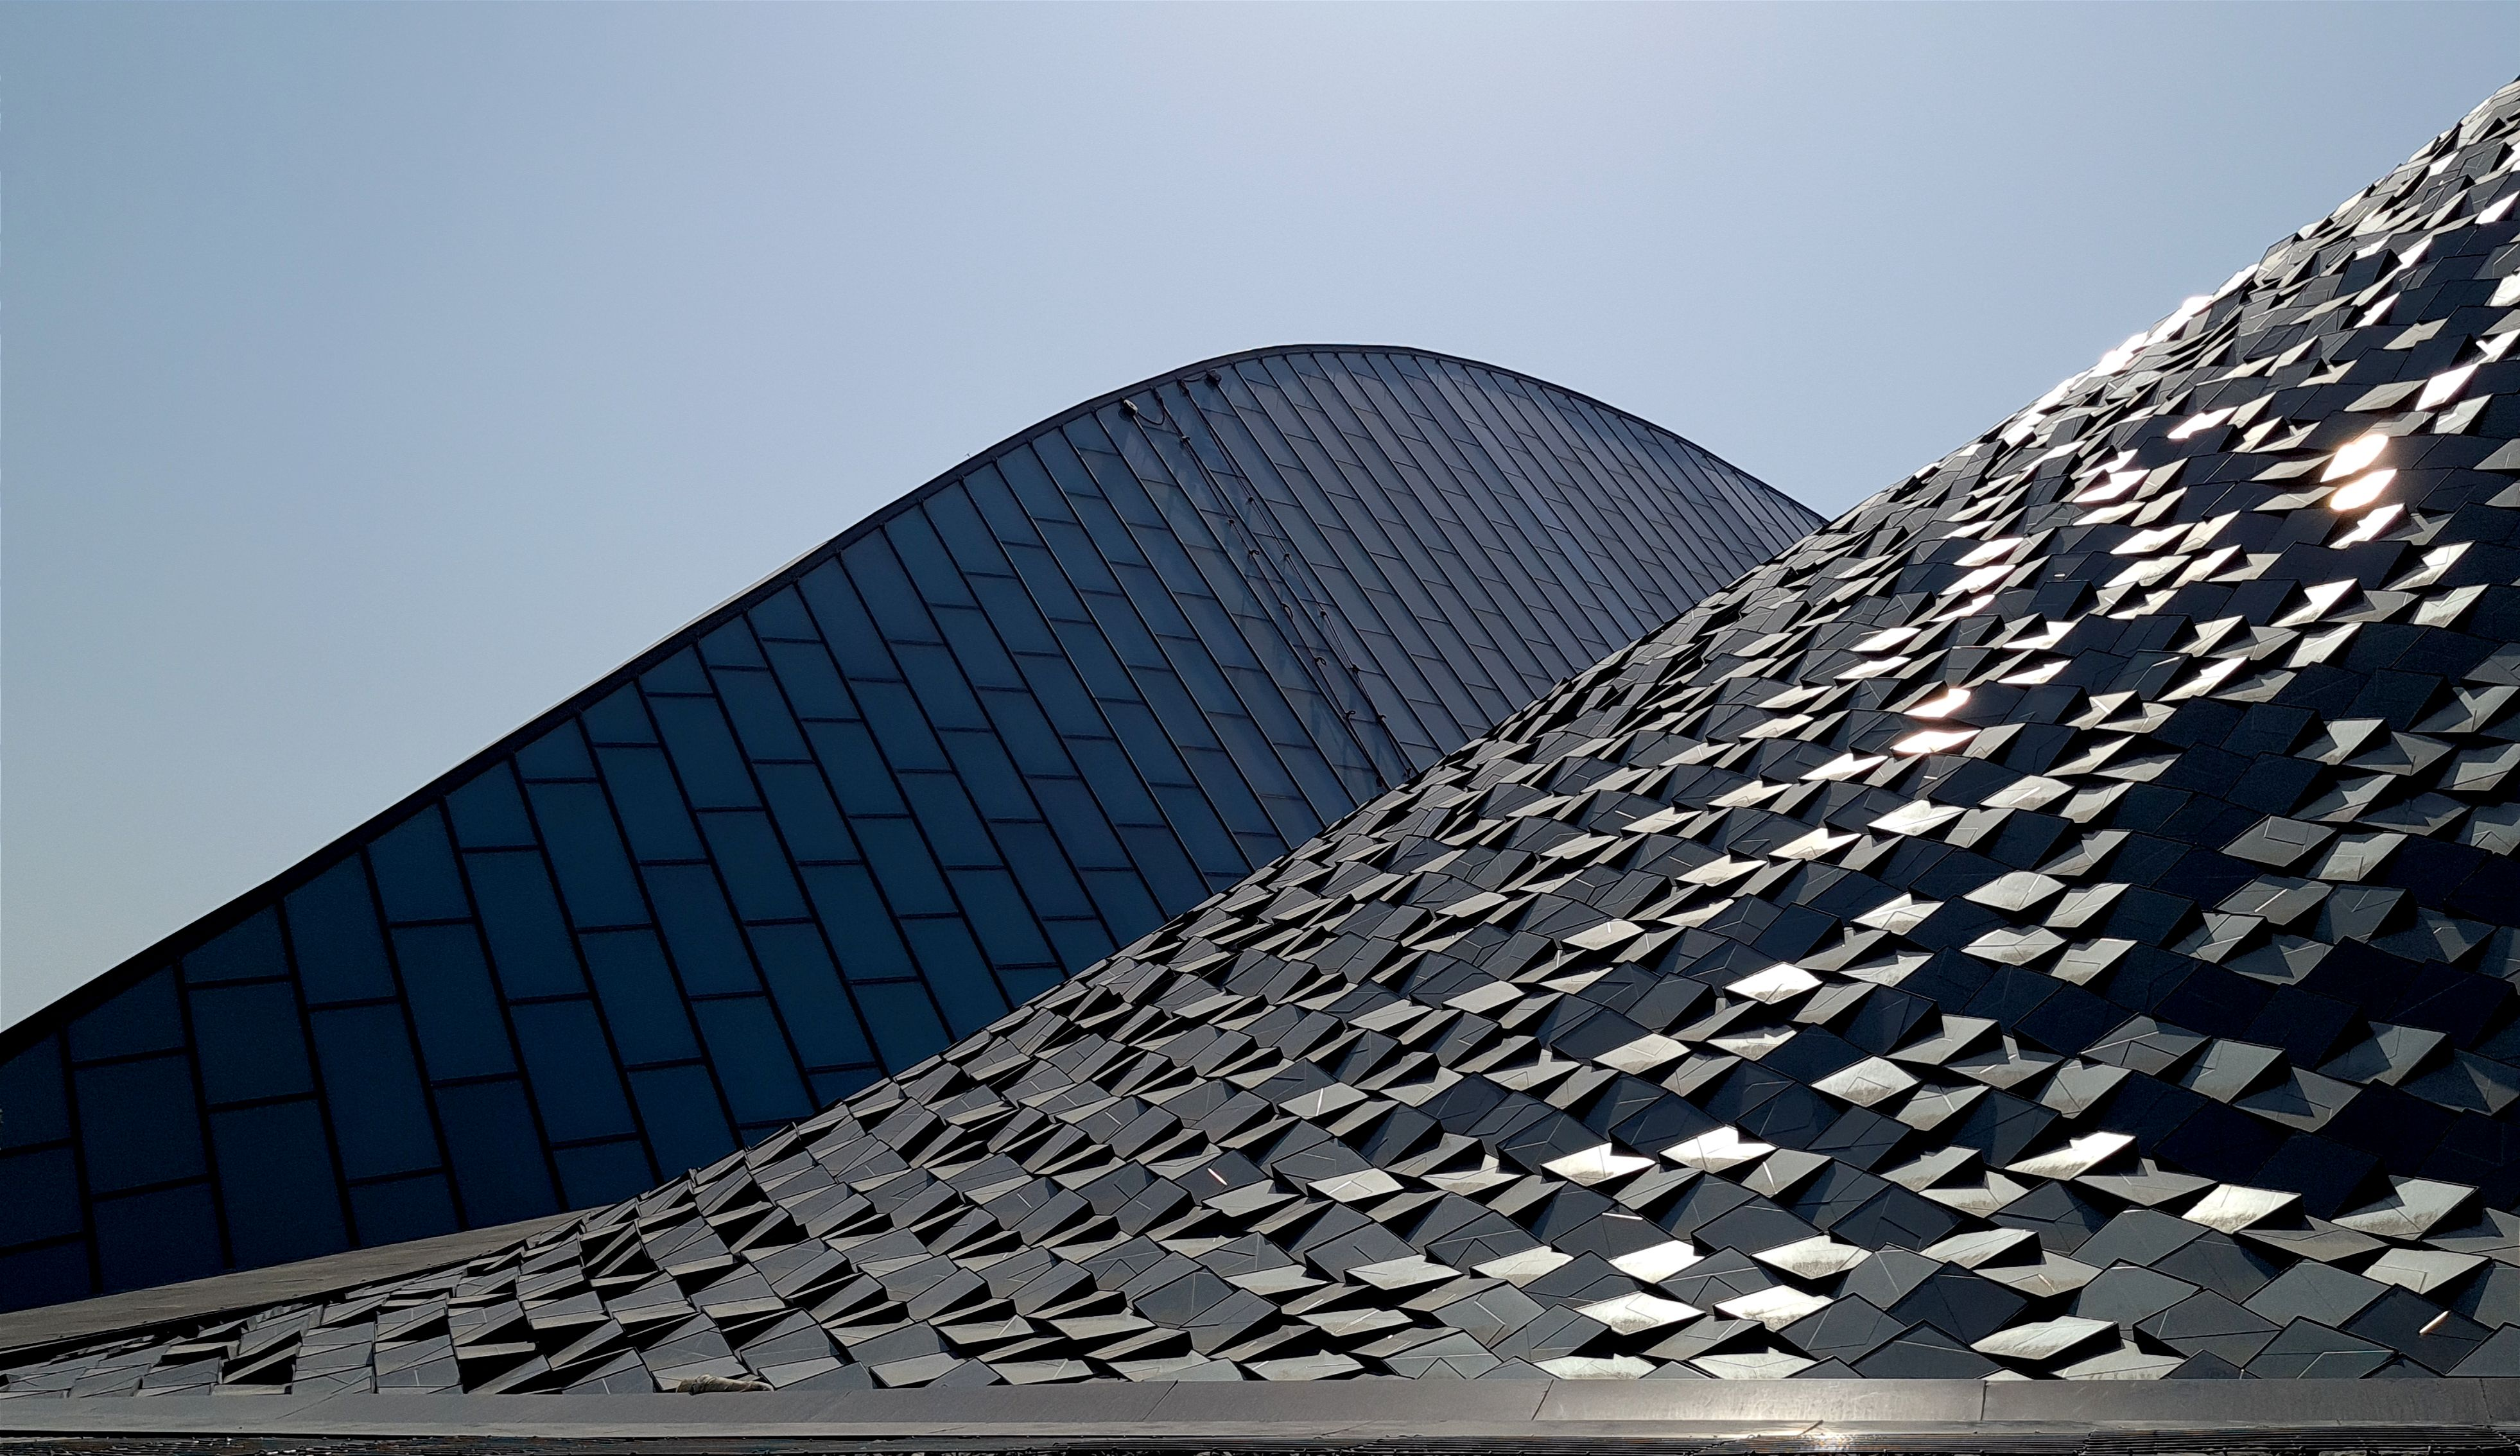 Roof Structure of UAE Pavilion, Abu Dhabi